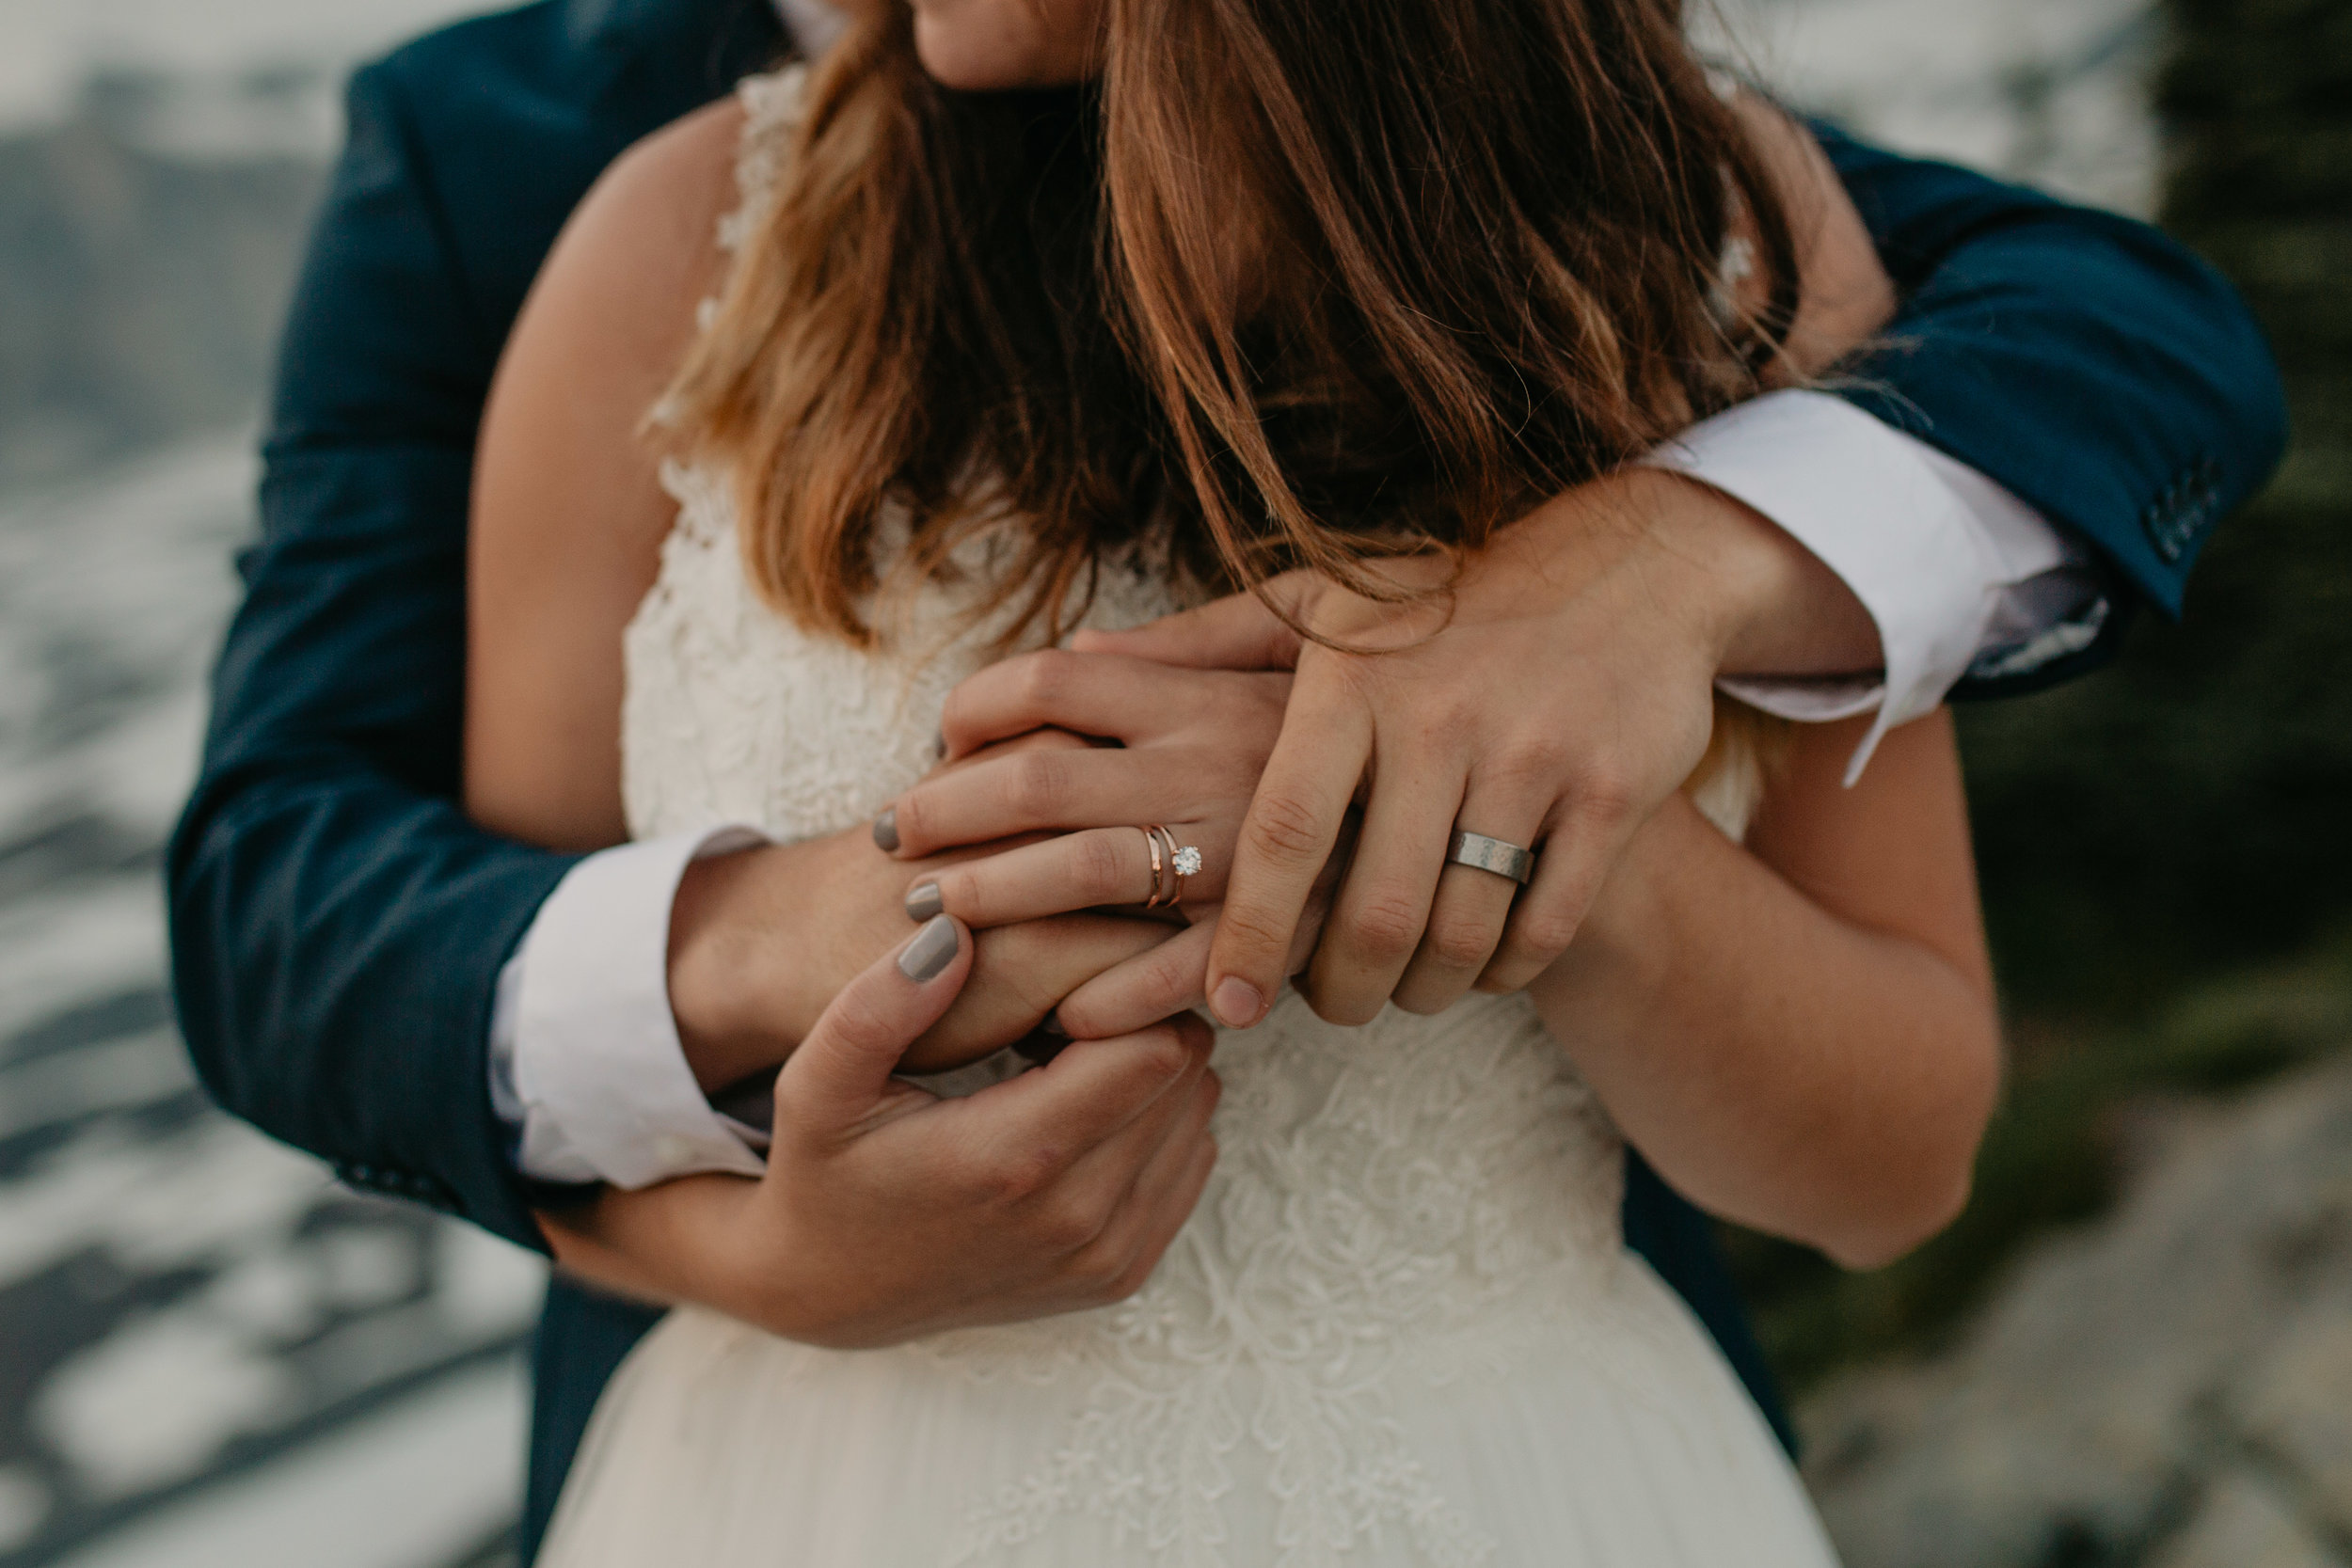 Nicole-Daacke-Photography-Mt-Rainier-elopement-photographer-washington-mountain-epic-wedding-photography-wildflowers-at-rainier-pine-tree-cloudy-summer-day-at-mountain-rainier-60.jpg